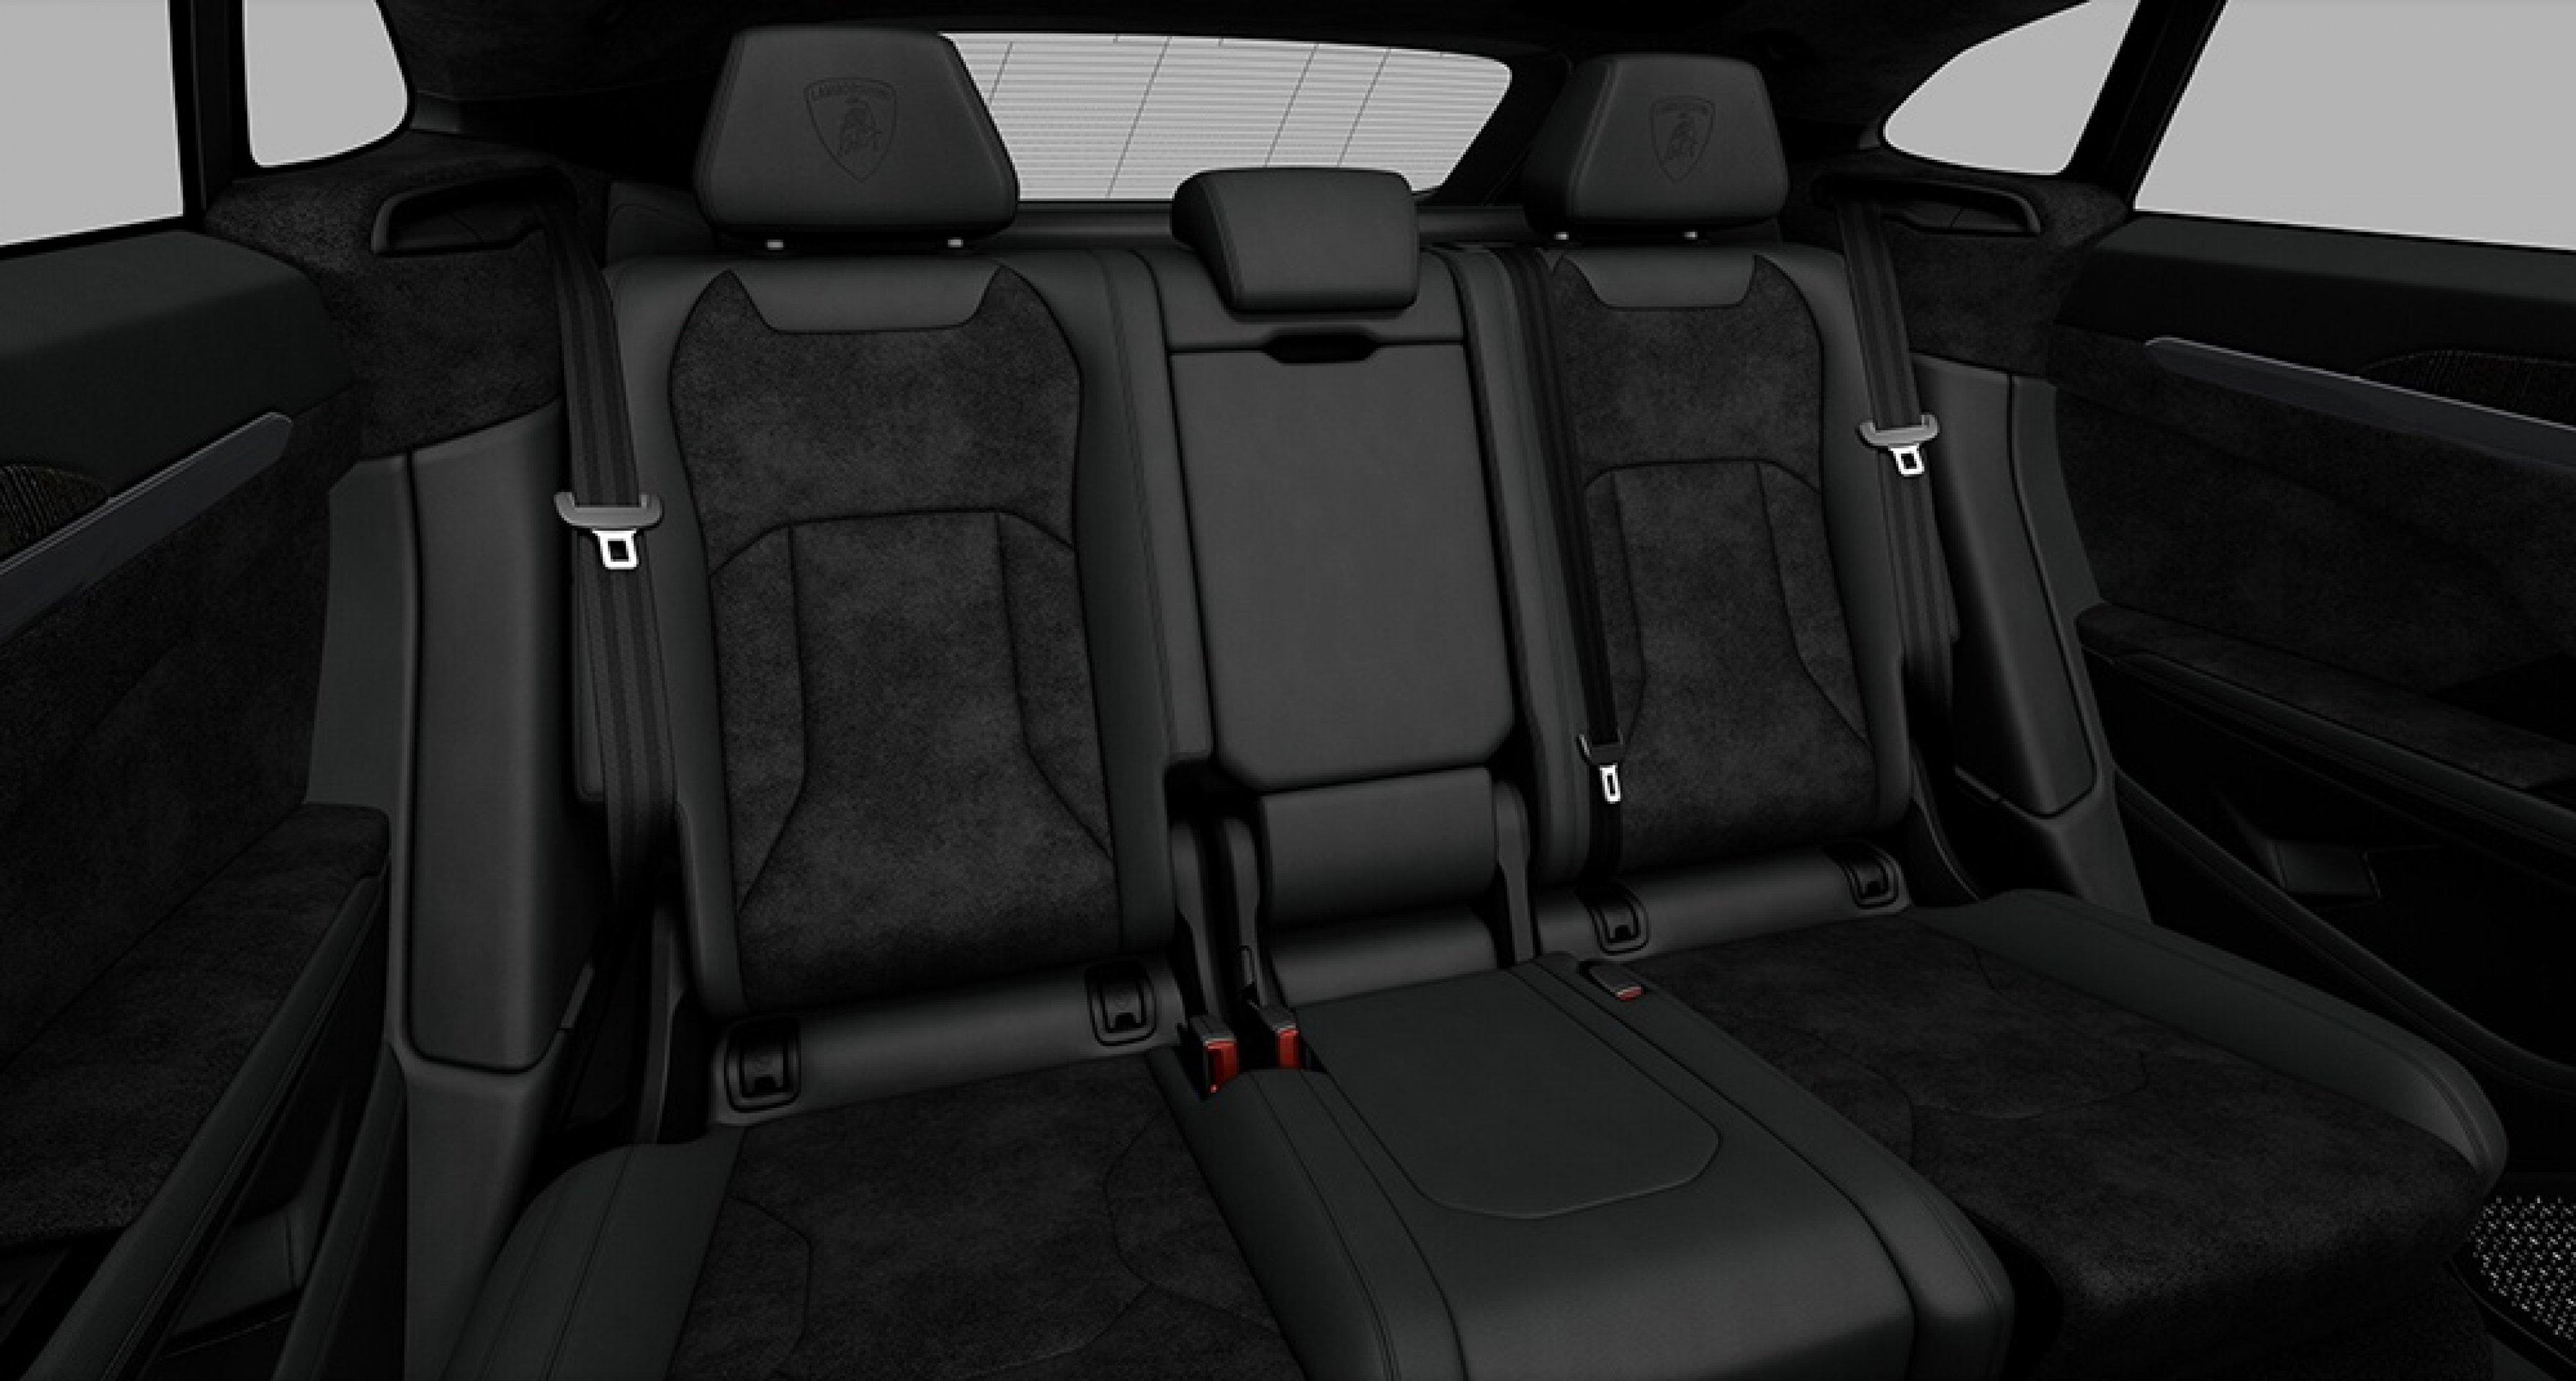 Let's get personal with the Lamborghini Urus | Classic